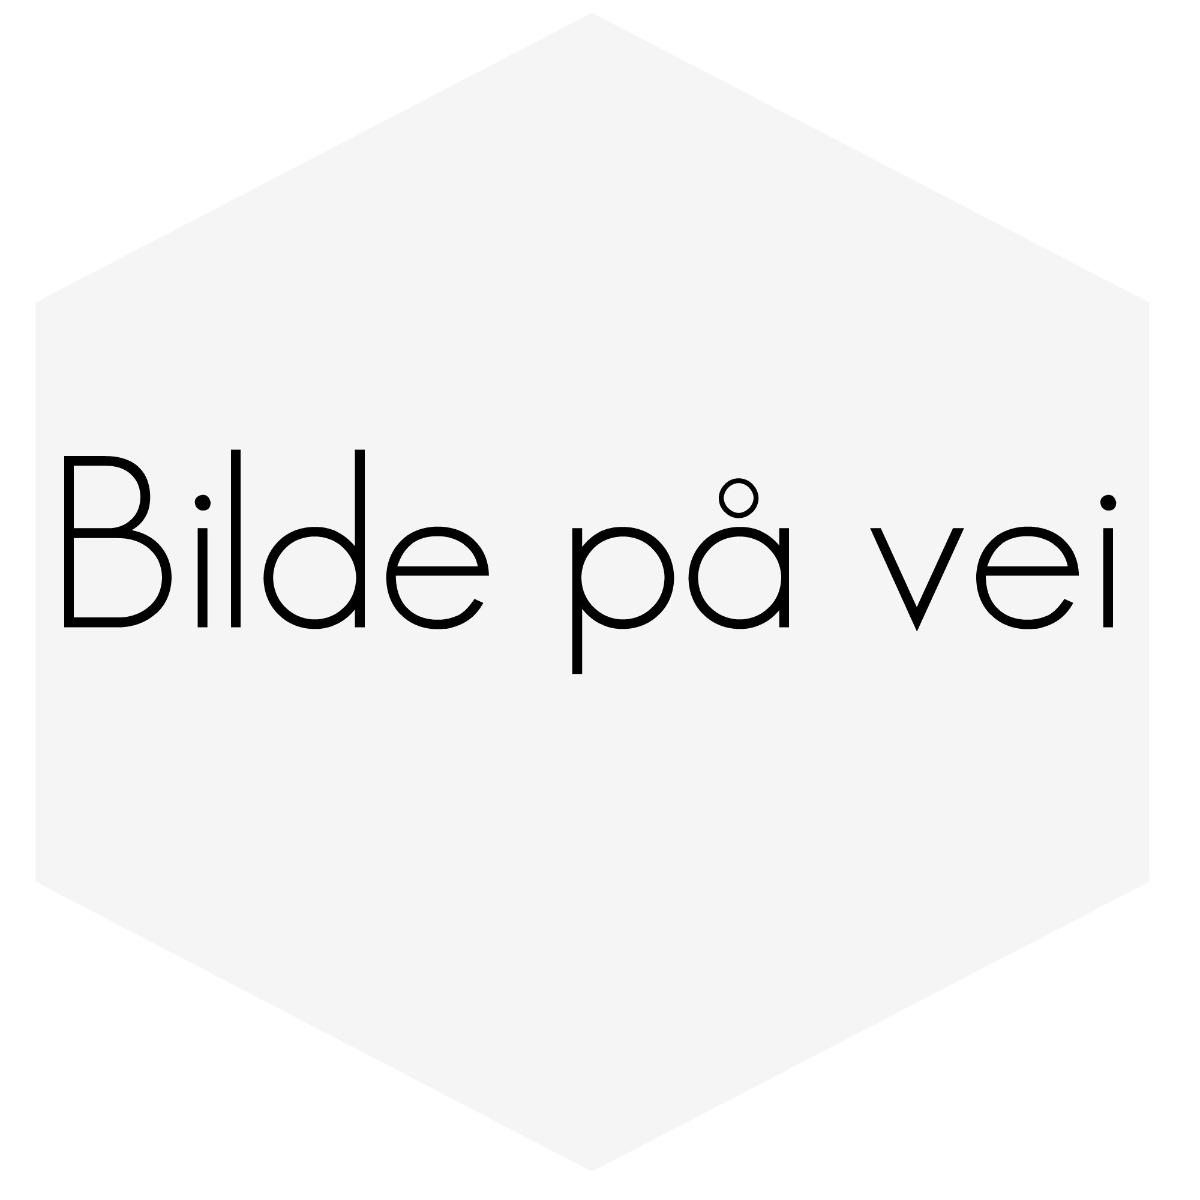 STYRESTAG INDRE PÅ TANNSTANG VOLVO V70N-2001>04 smi 274179